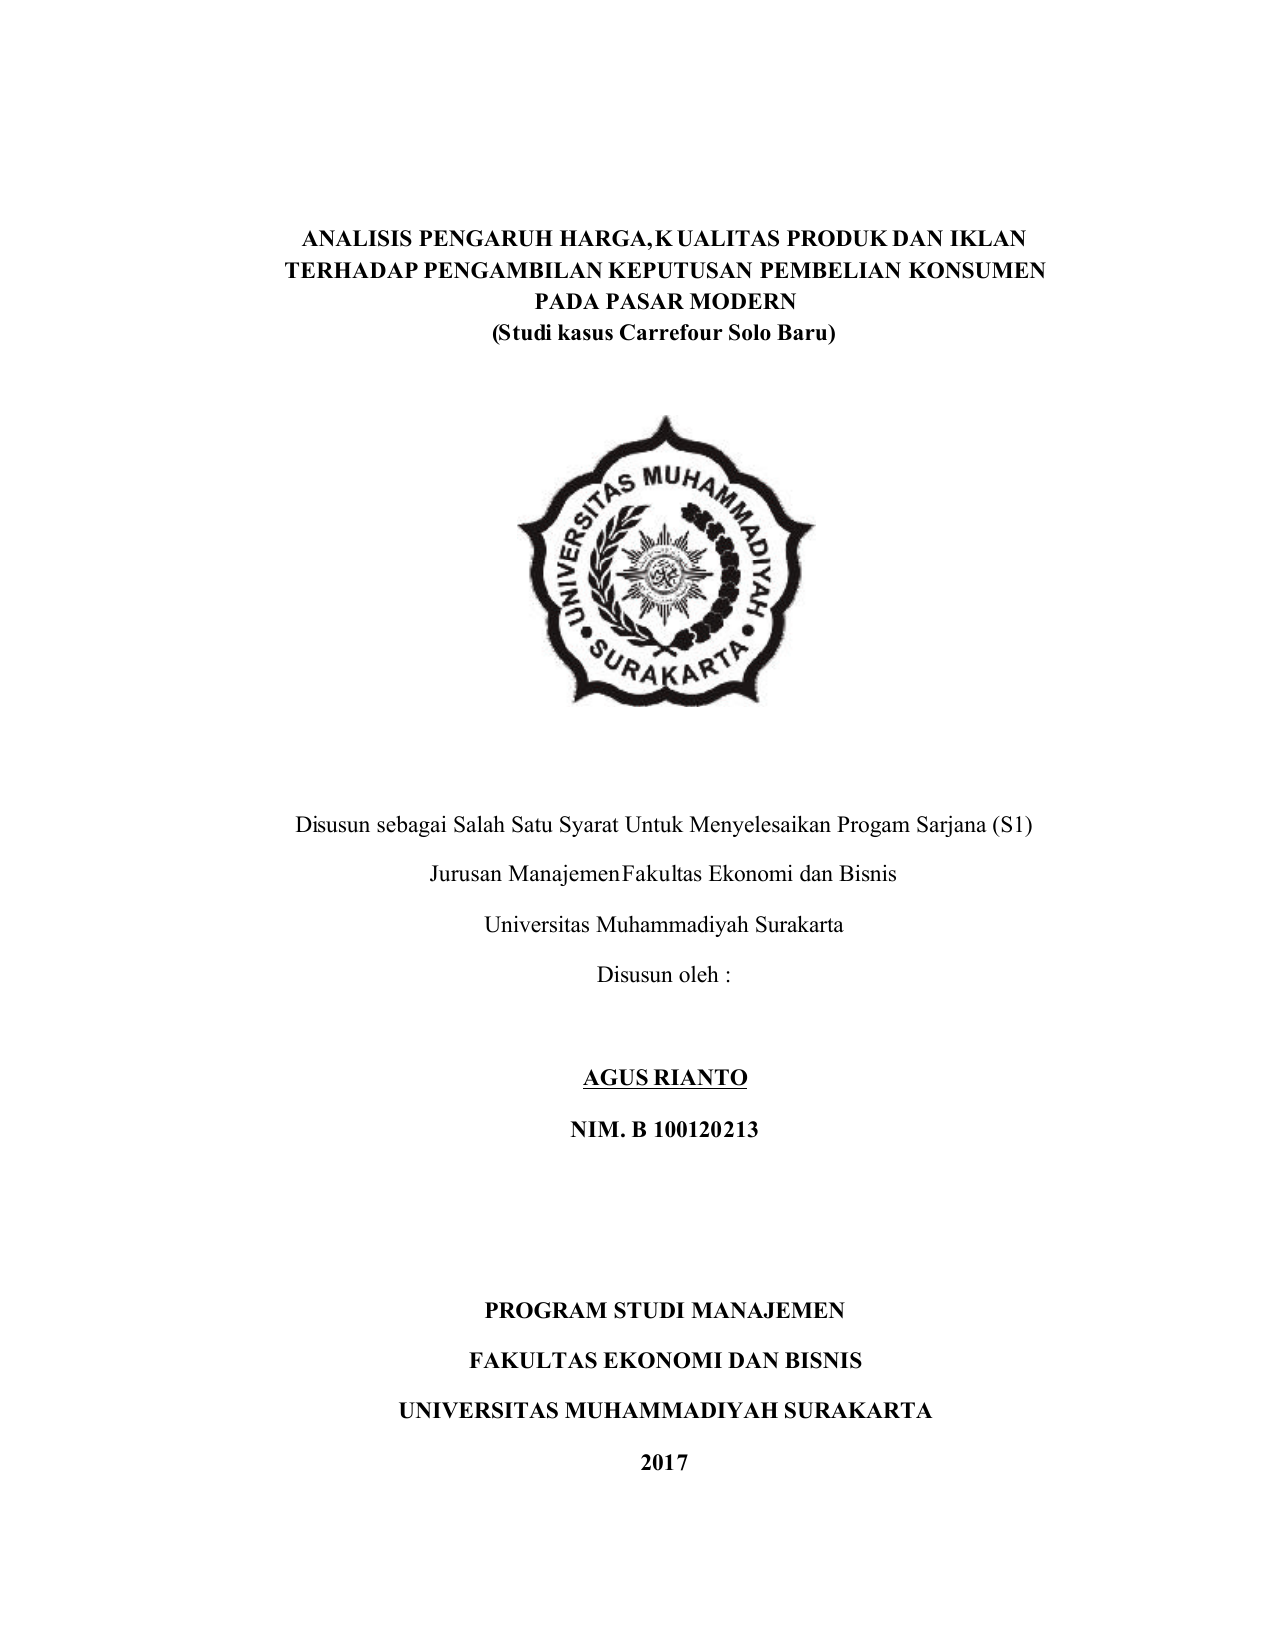 Naskah Publikasi Universitas Muhammadiyah Surakarta